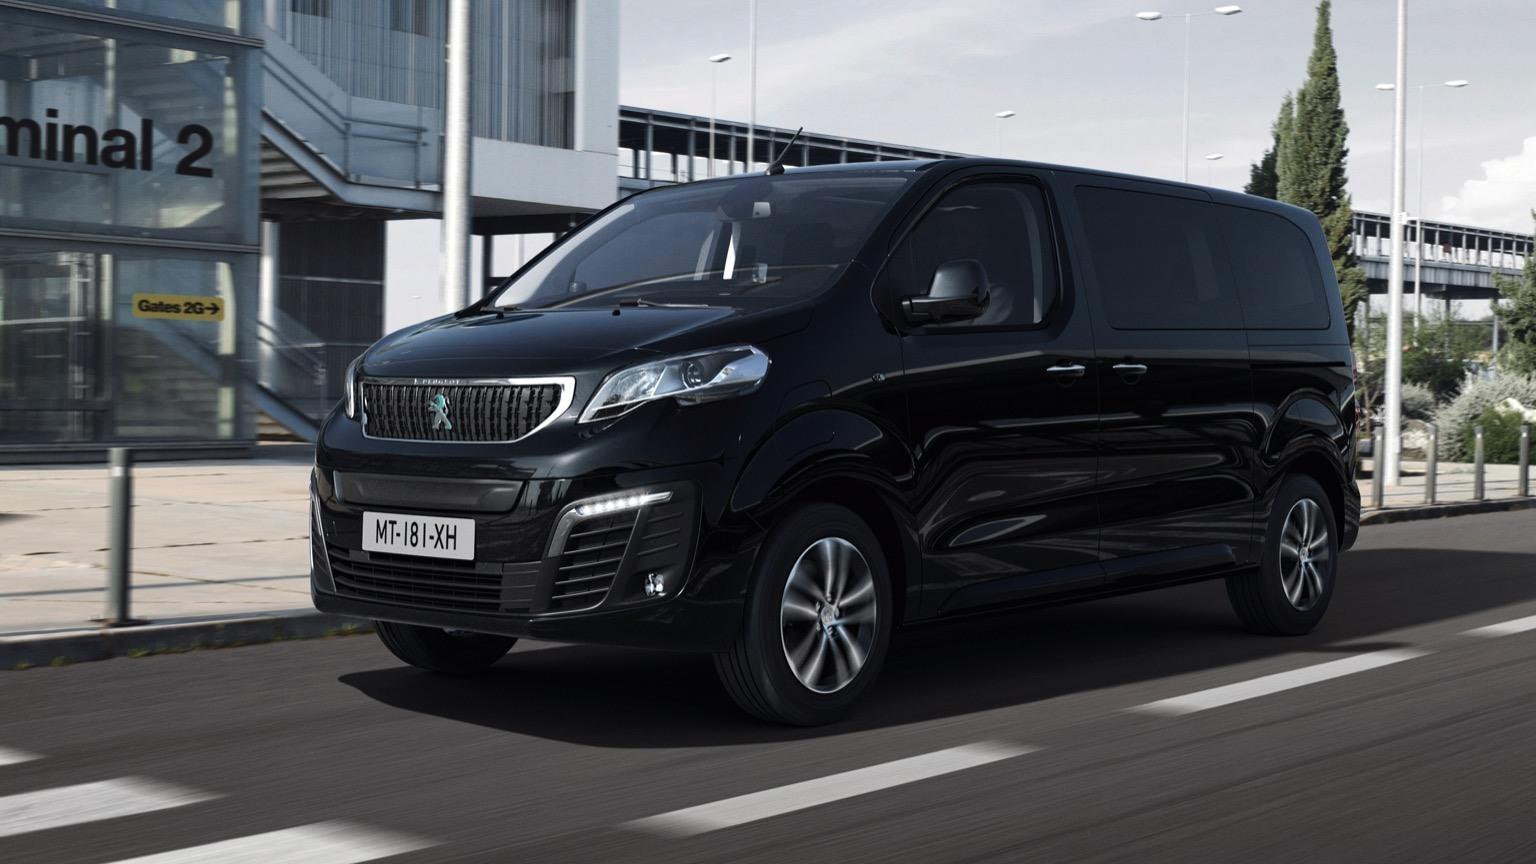 Peugeot e-Traveller Compact 50 kWh